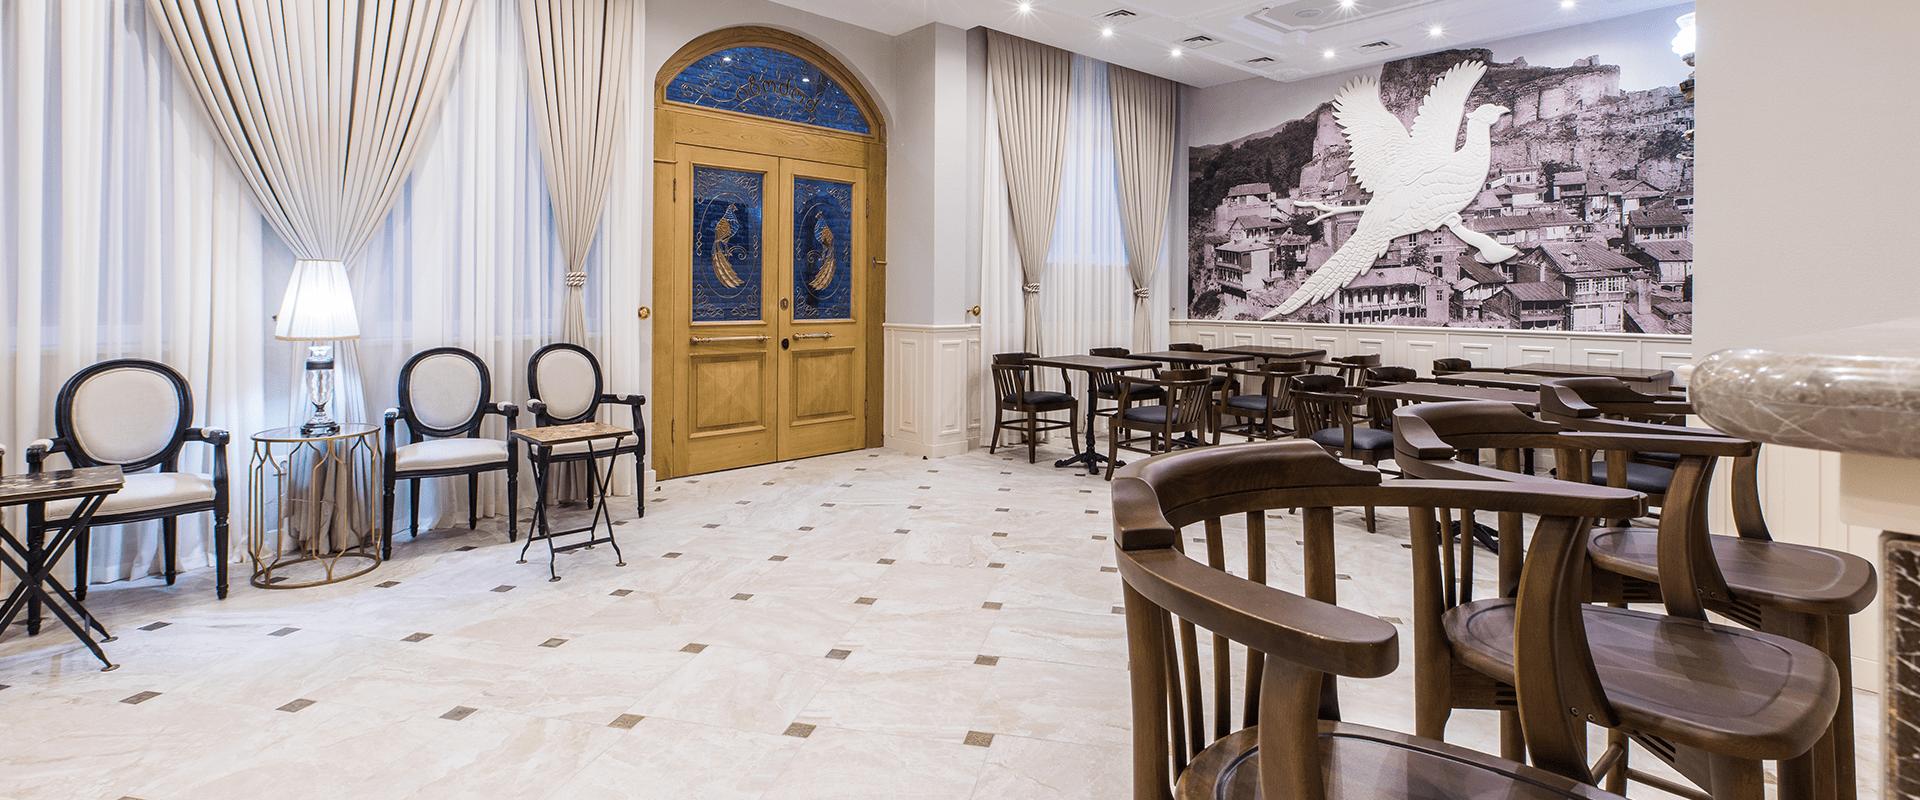 boutique hotel in tbilisi georgia